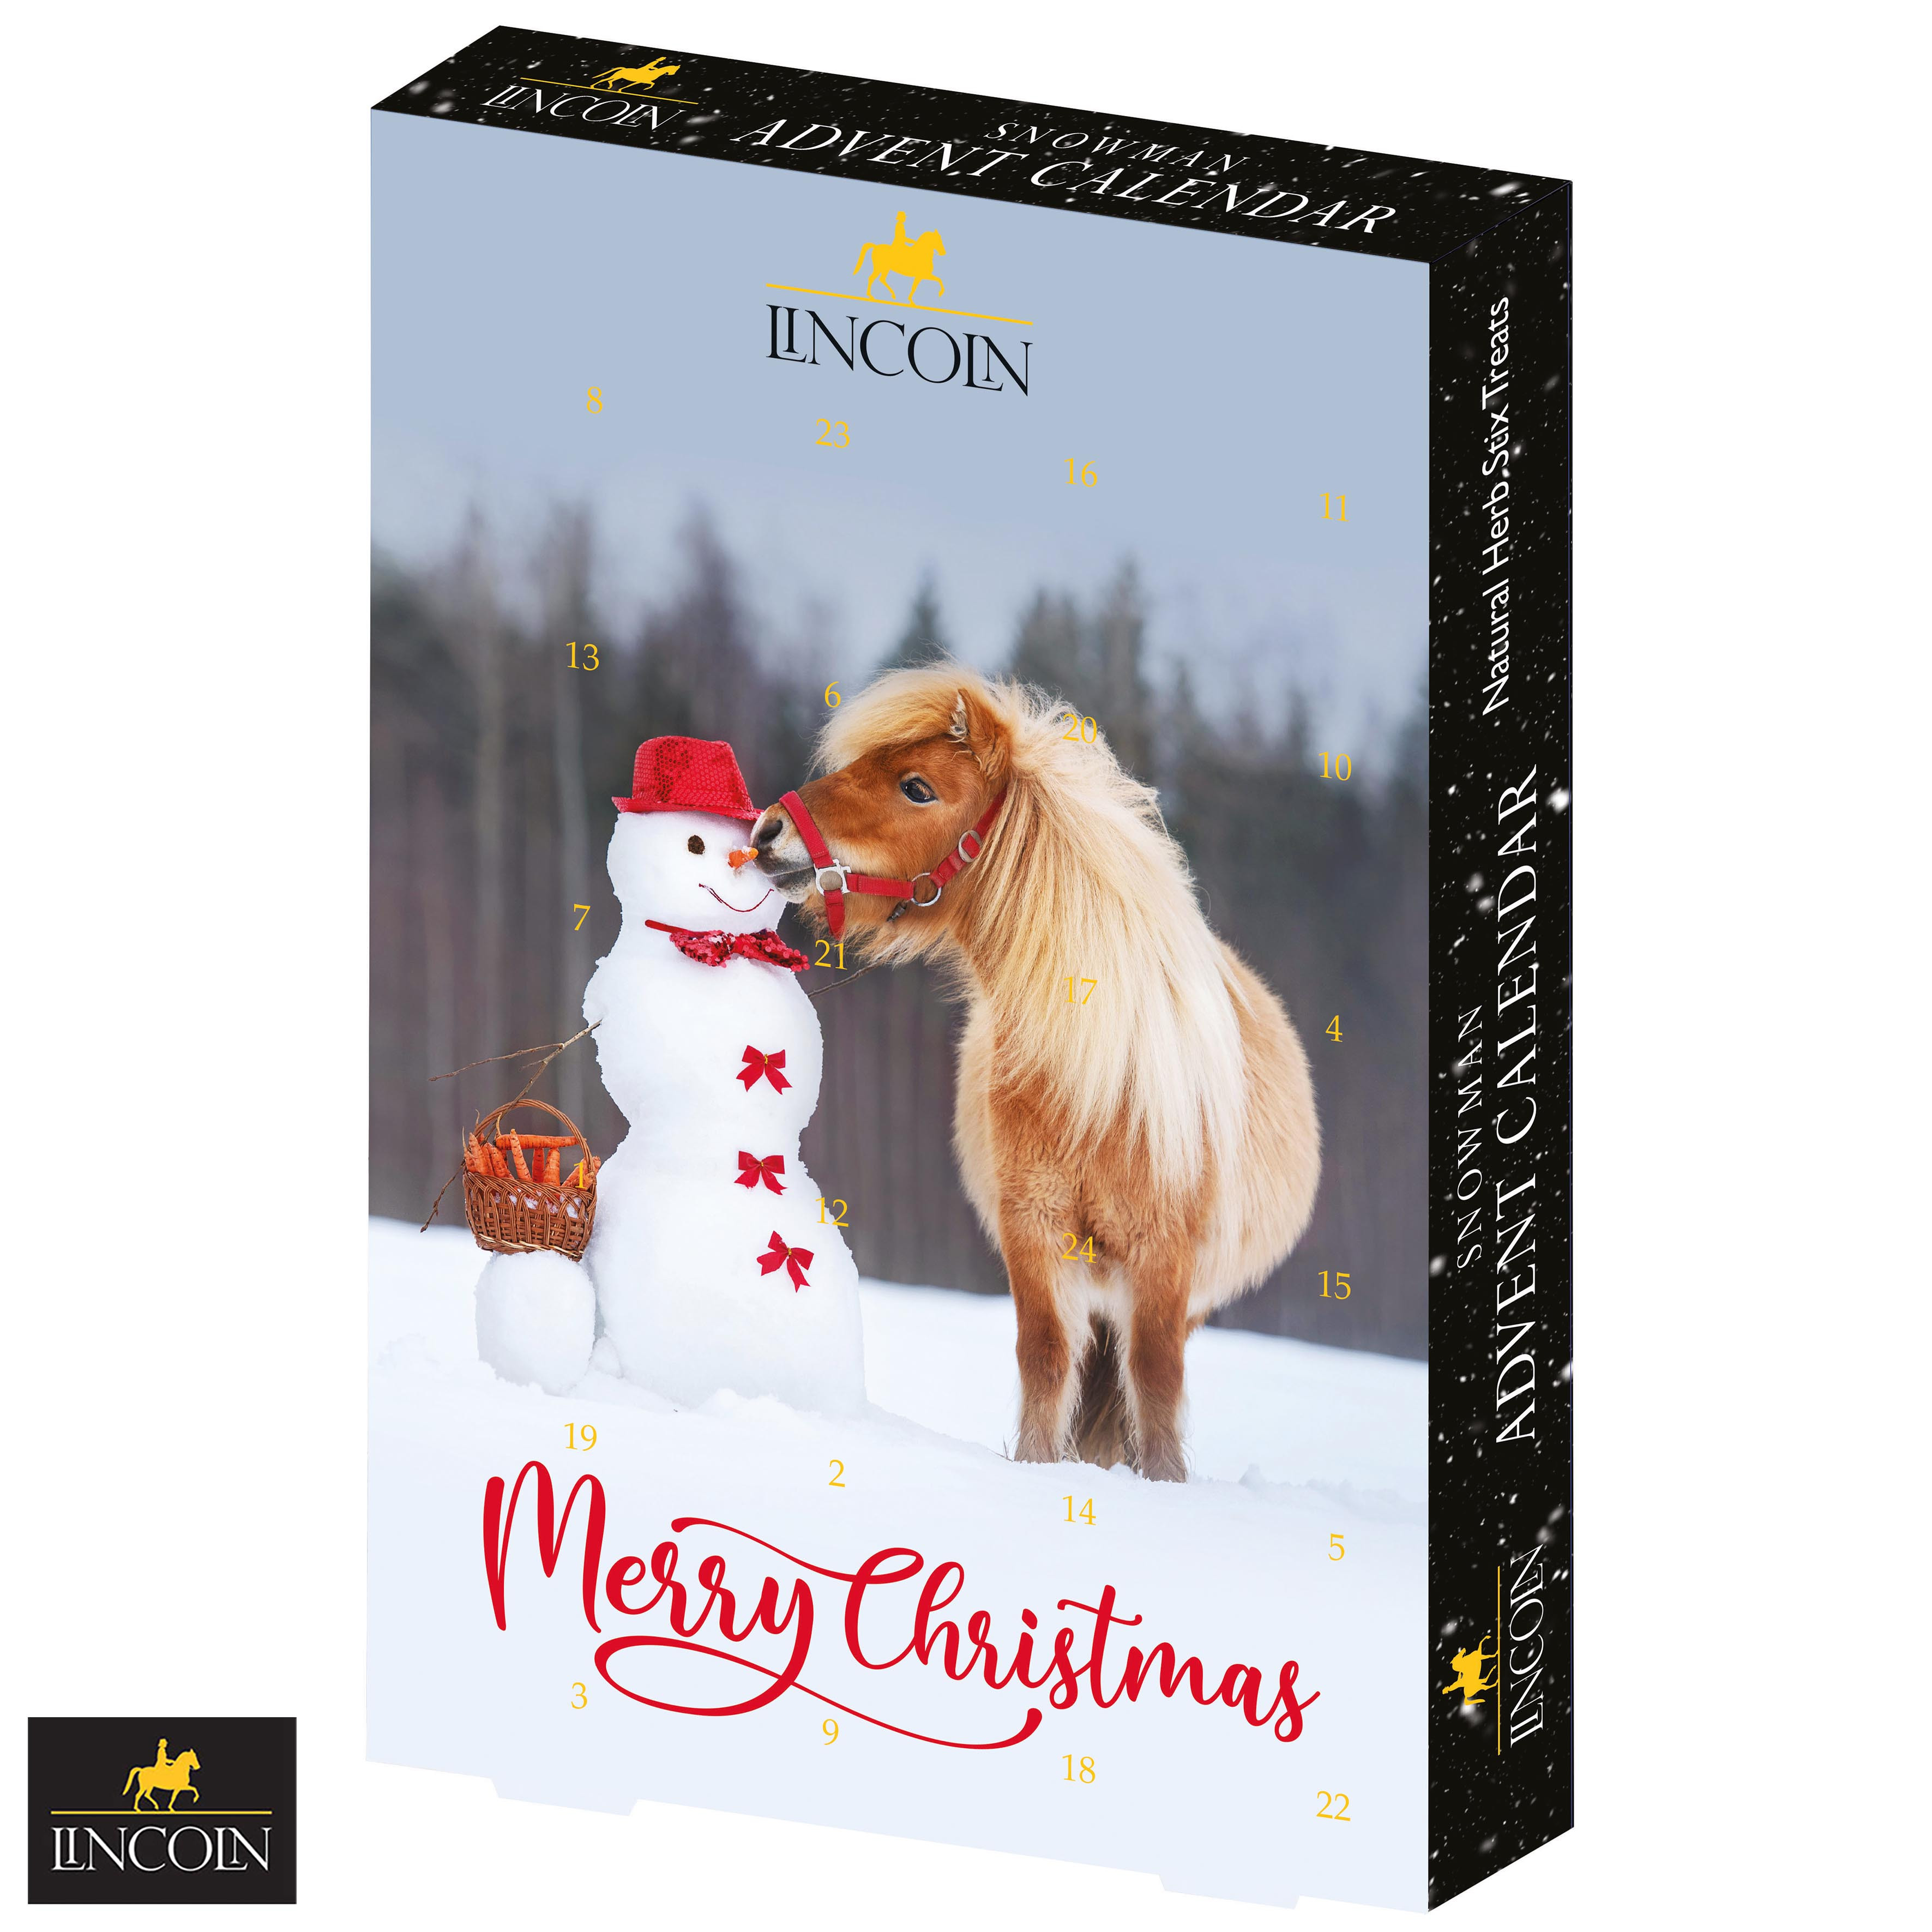 Lincoln Christmas Herb Stix Advent Calendar